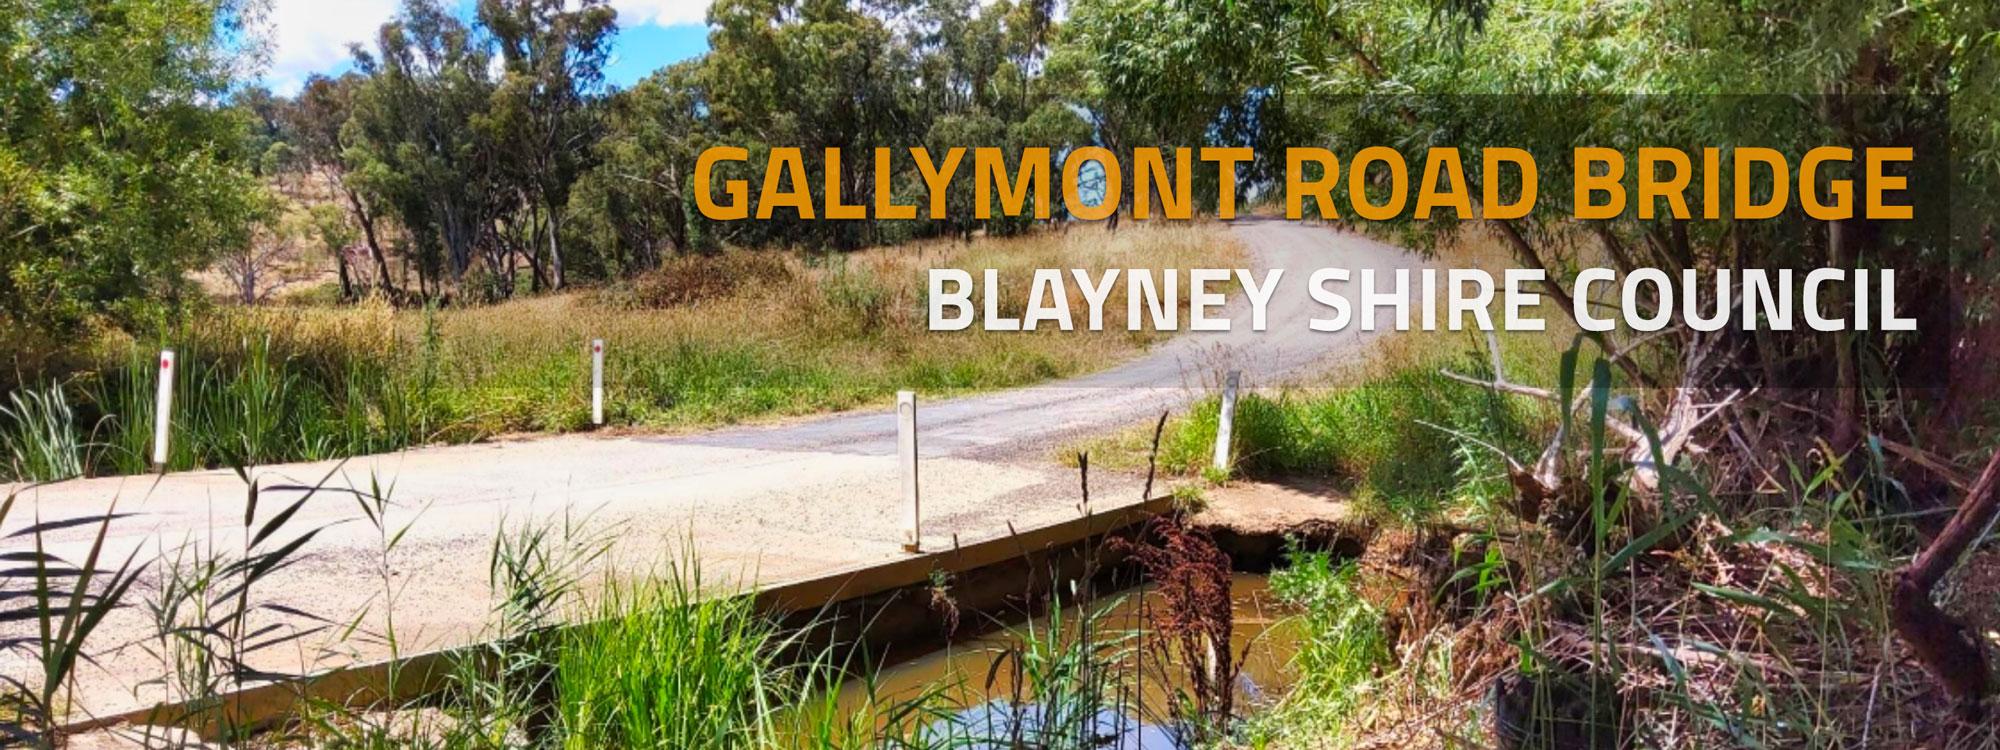 gallymont-road-bridge-blayney-shire-council-header